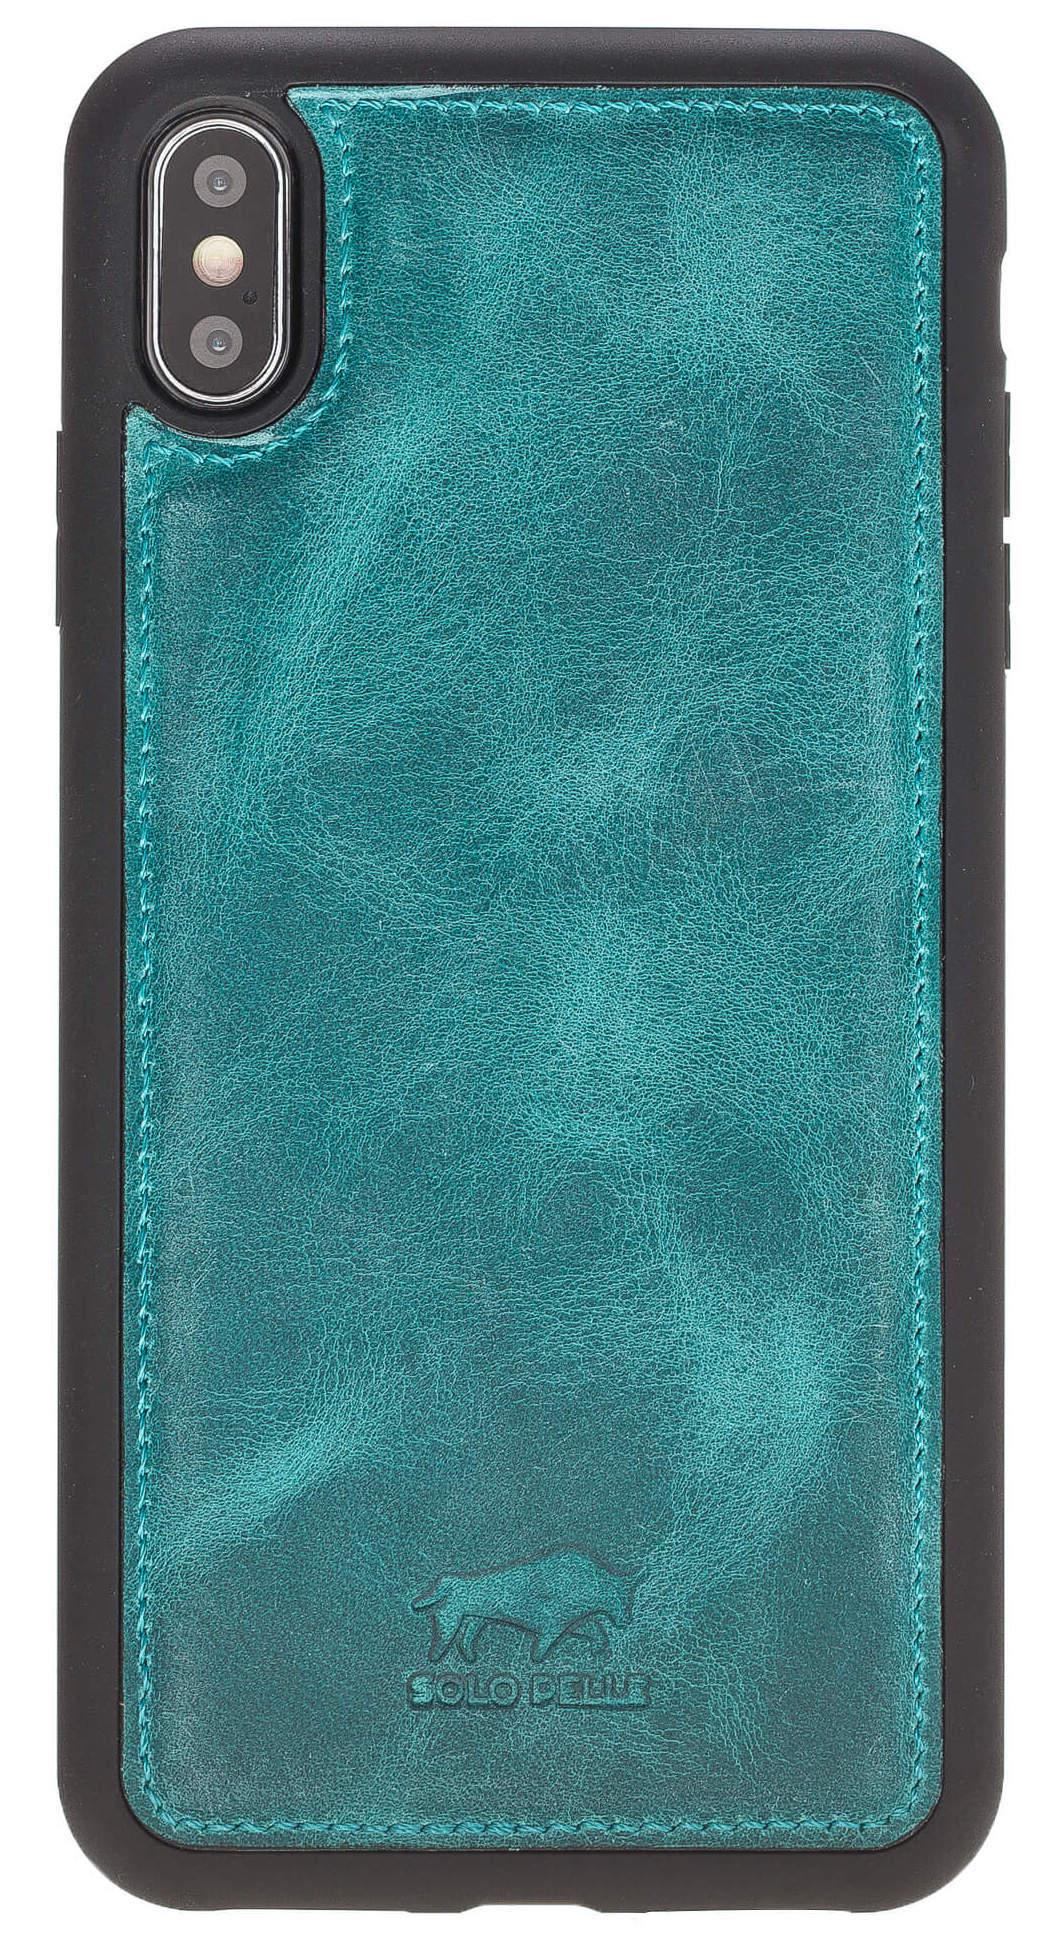 iPhone XS Max Case Stanford Ledertasche aus echtem Leder in Vintage Türkis